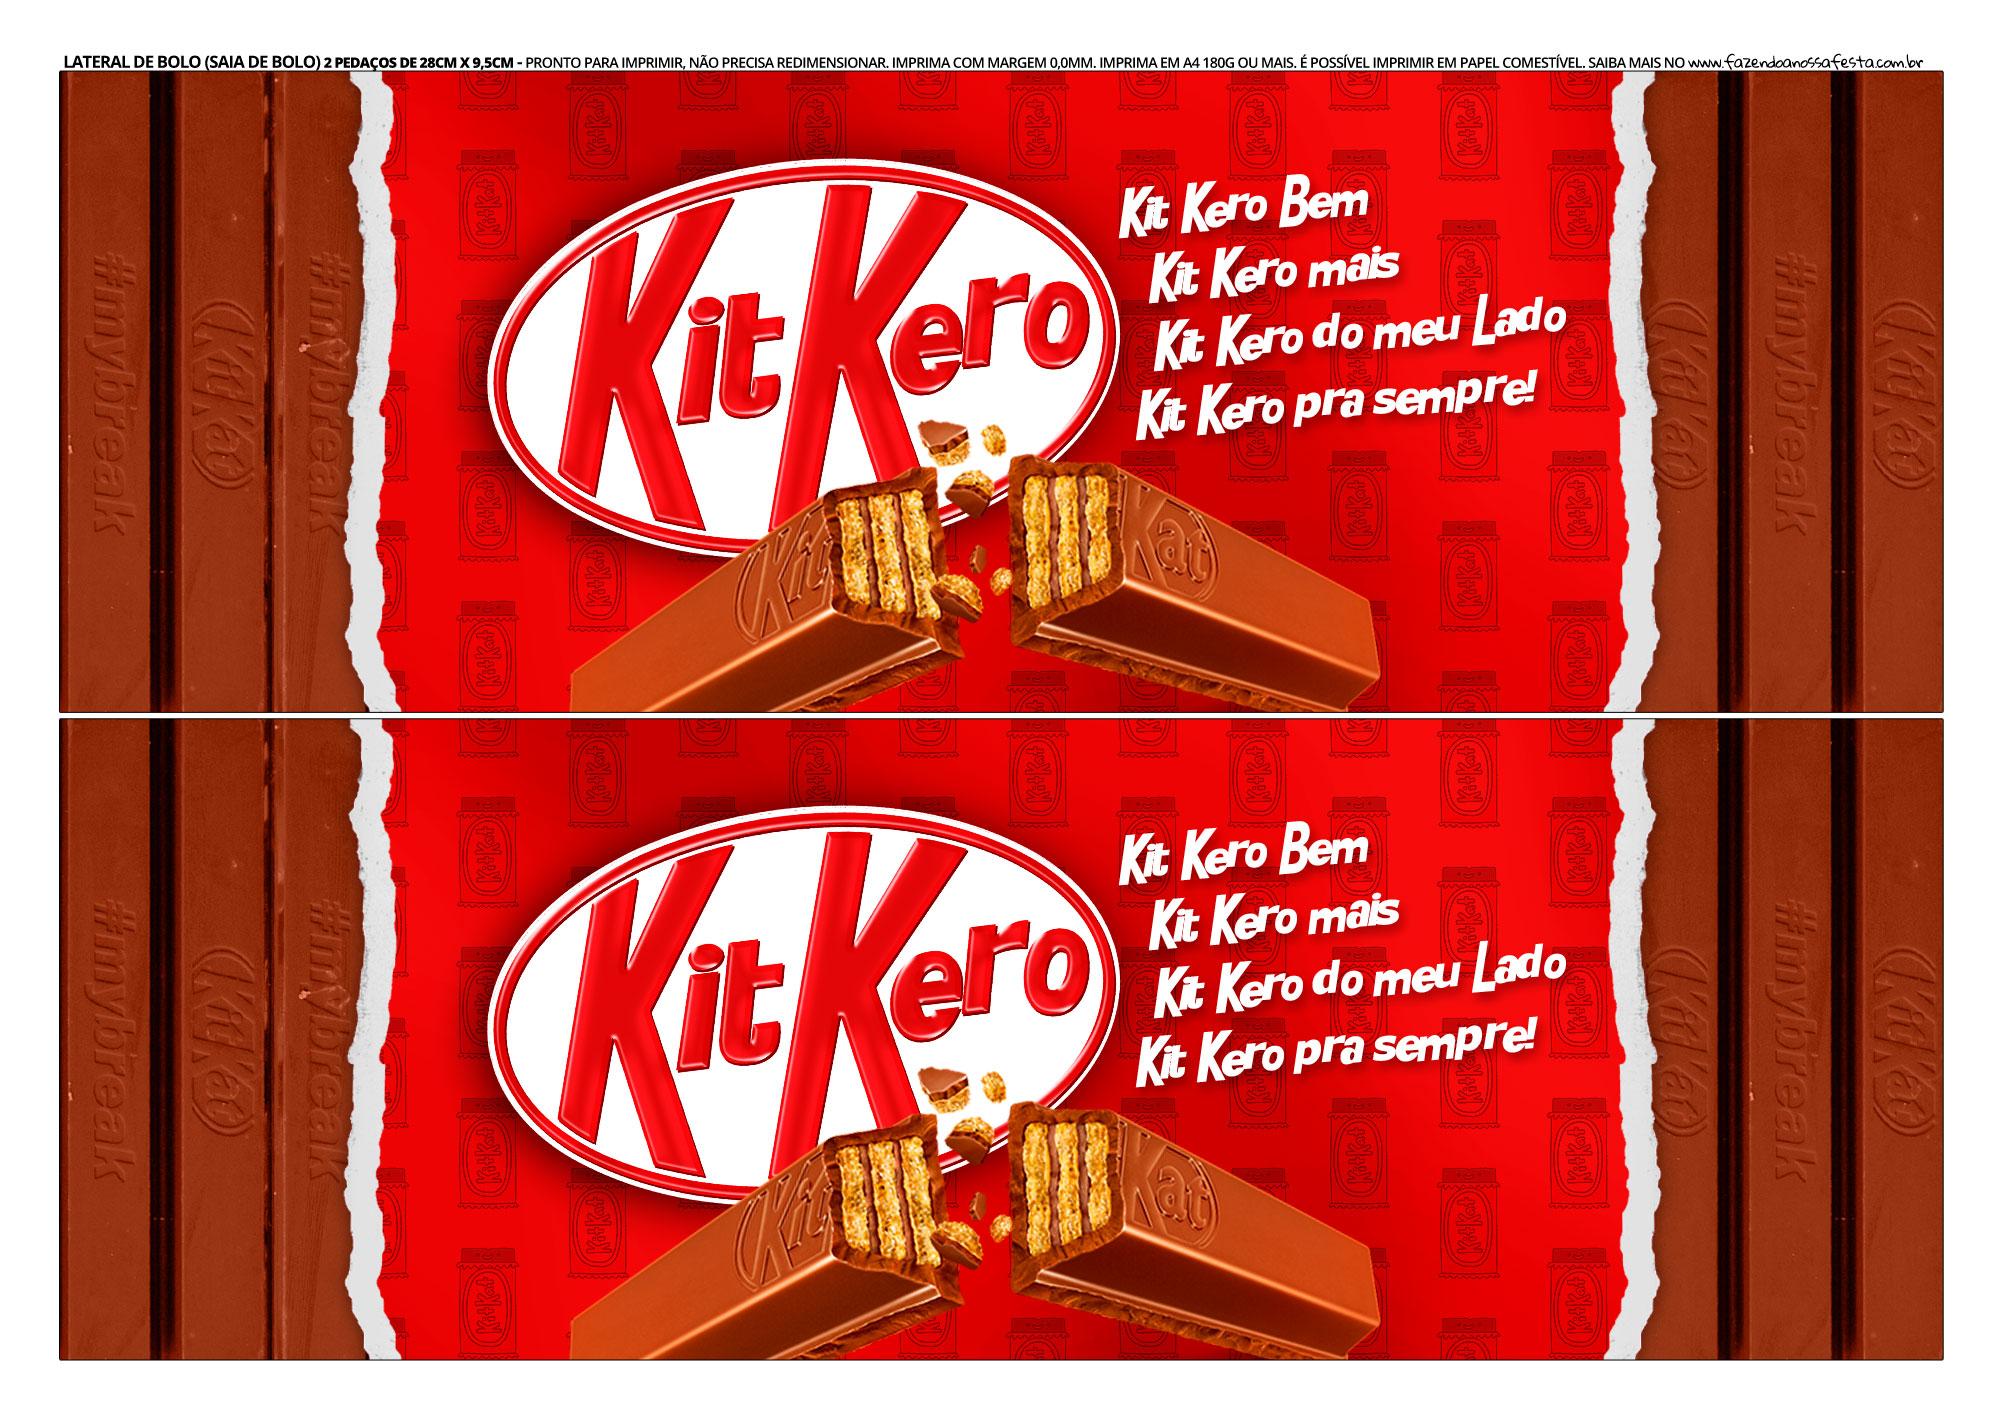 Faixa Lateral para Bolo Dia das Maes Kit Kat